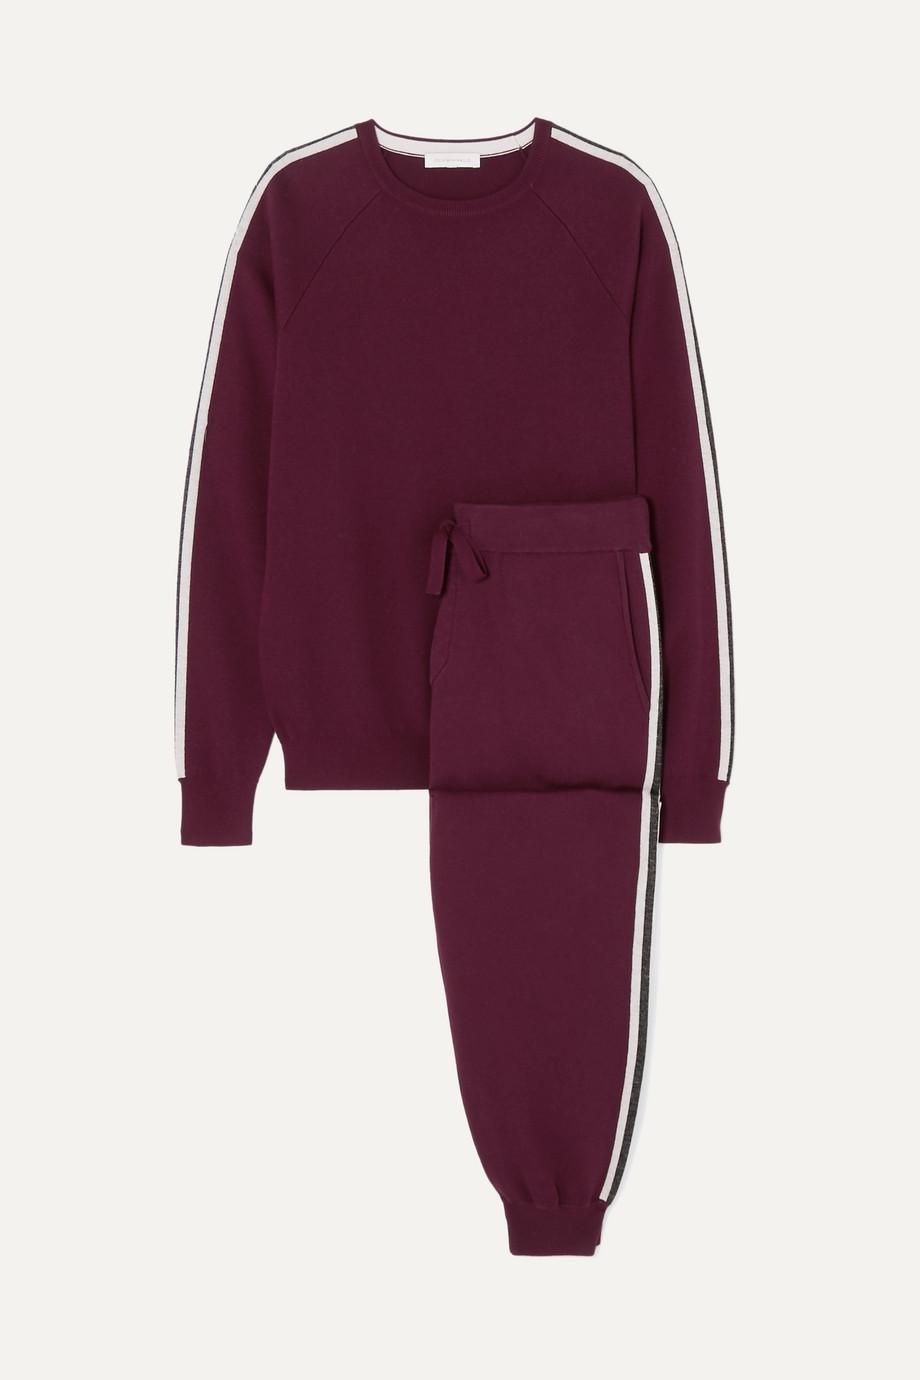 Olivia von Halle Missy Bordeaux striped silk and cashmere-blend sweatshirt and track pants set